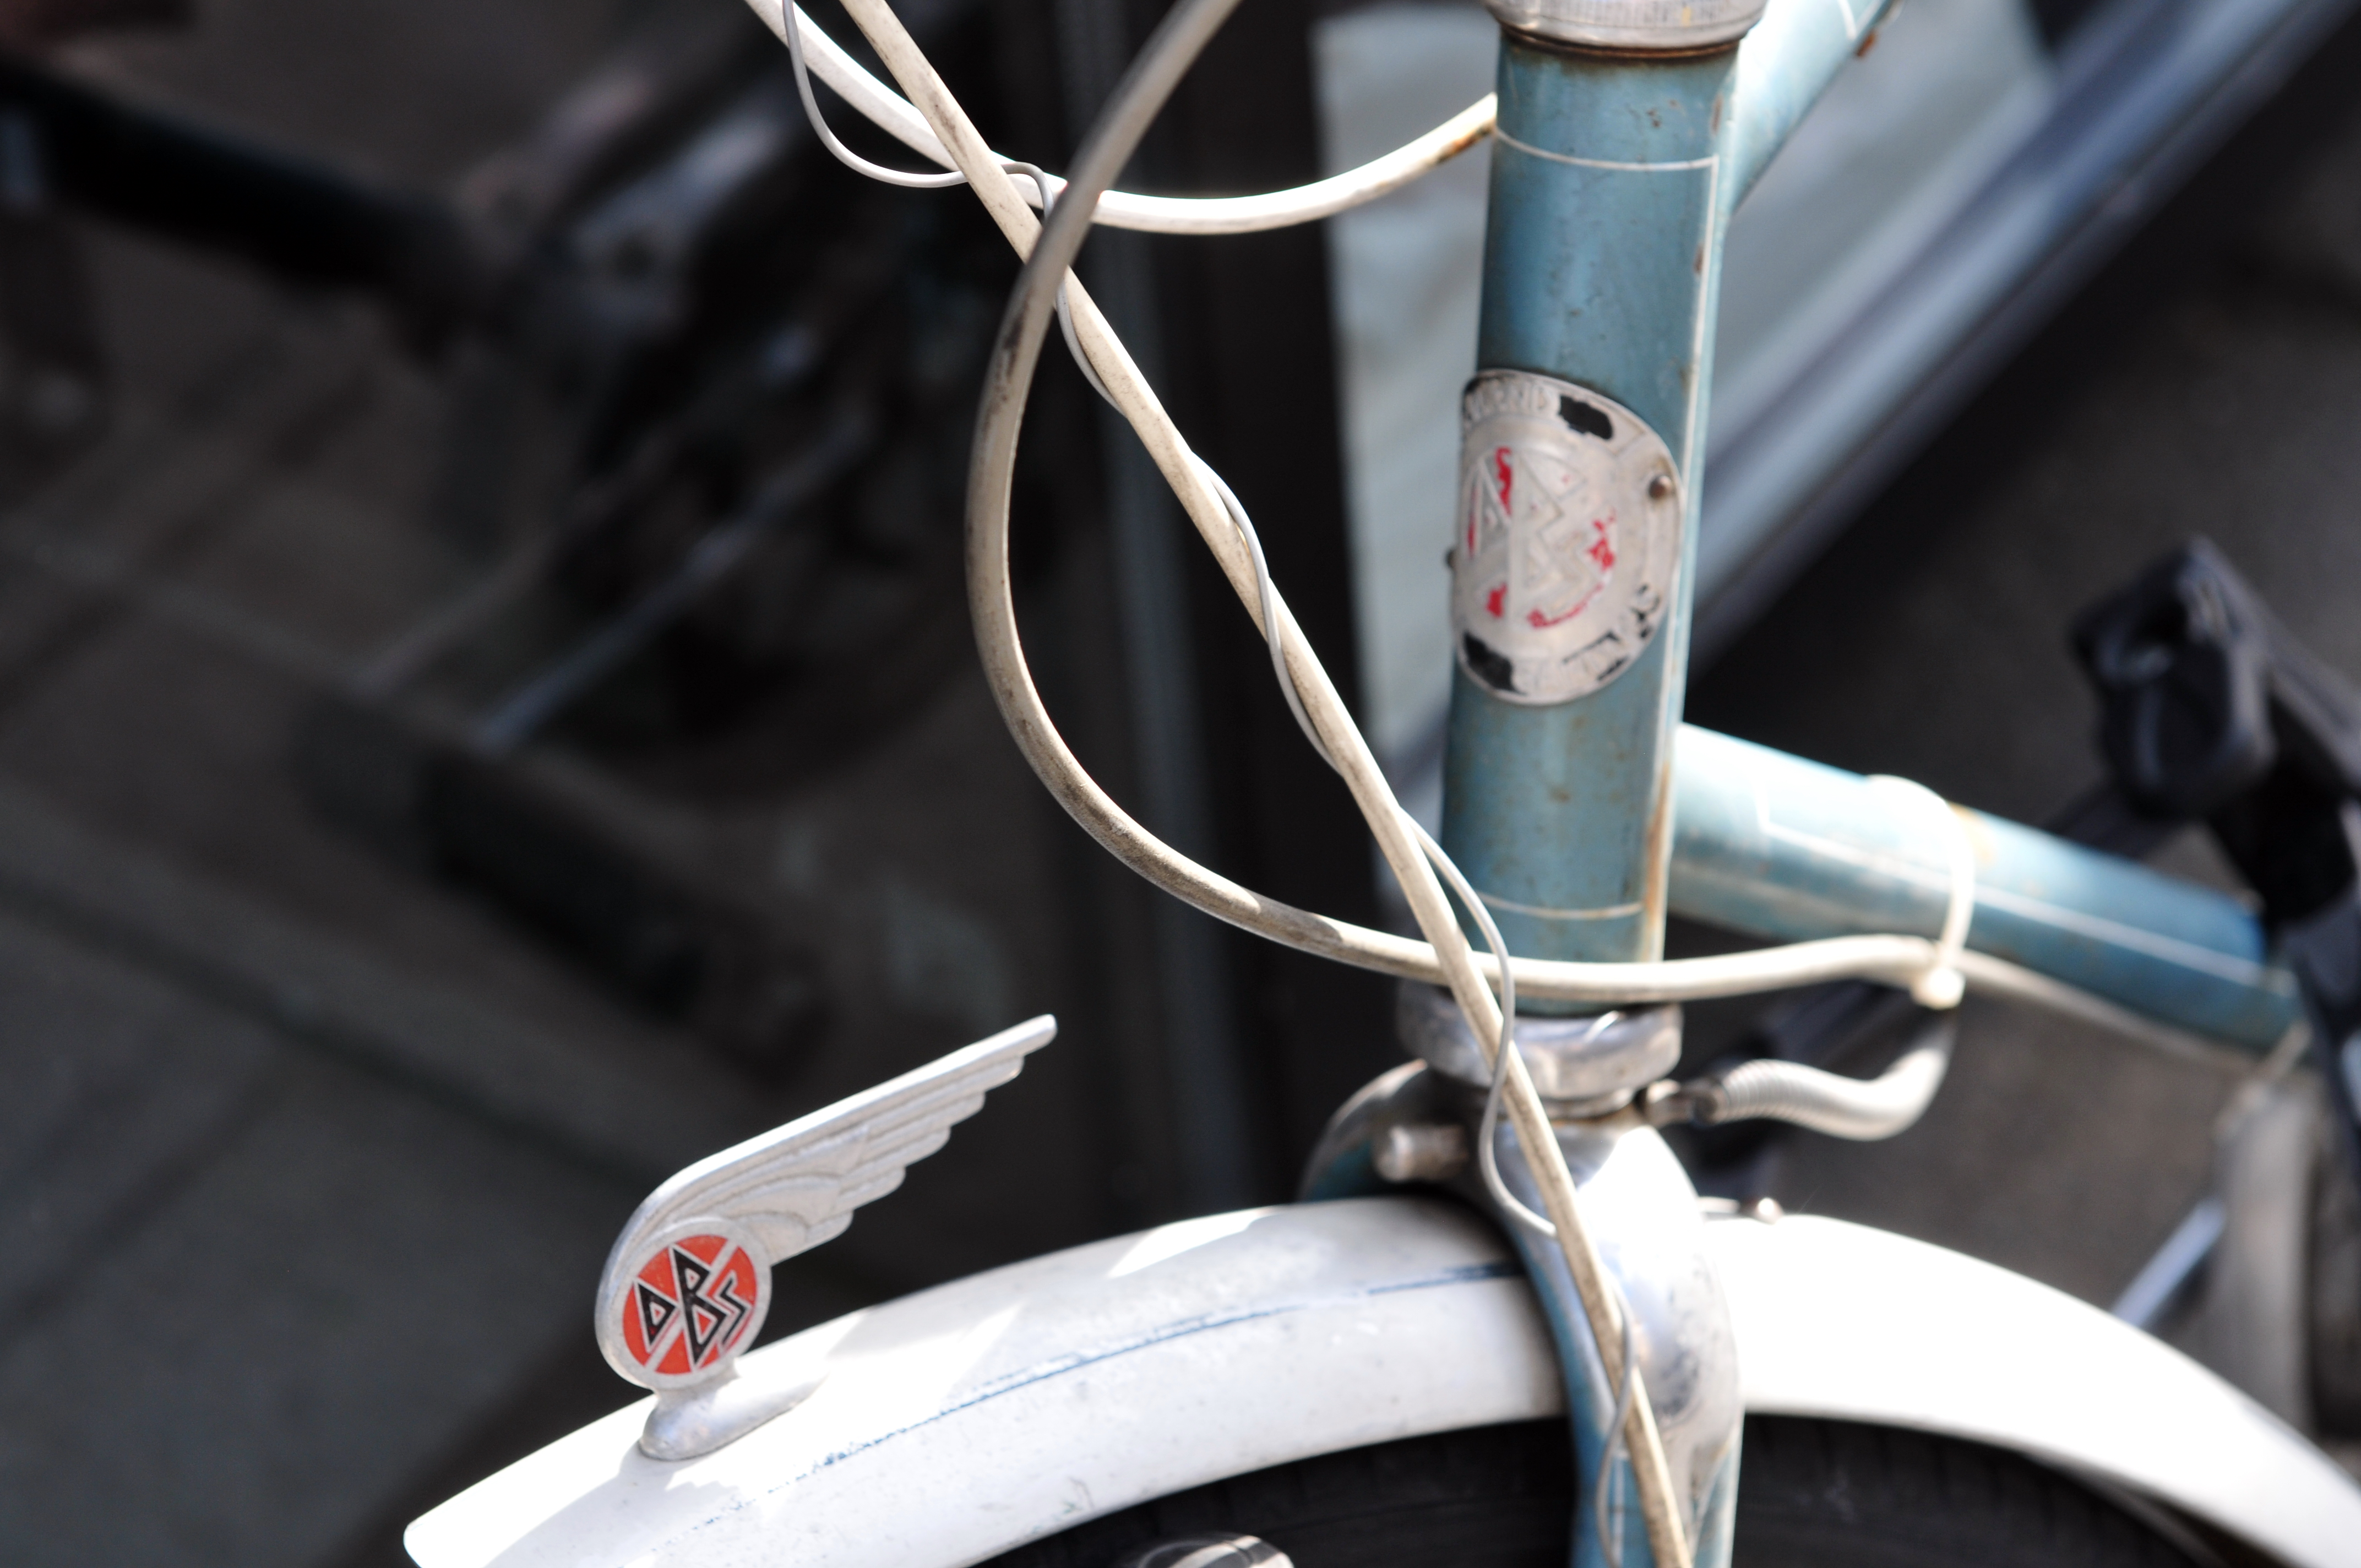 14-09-02-fahrrad-oslo-43.jpg